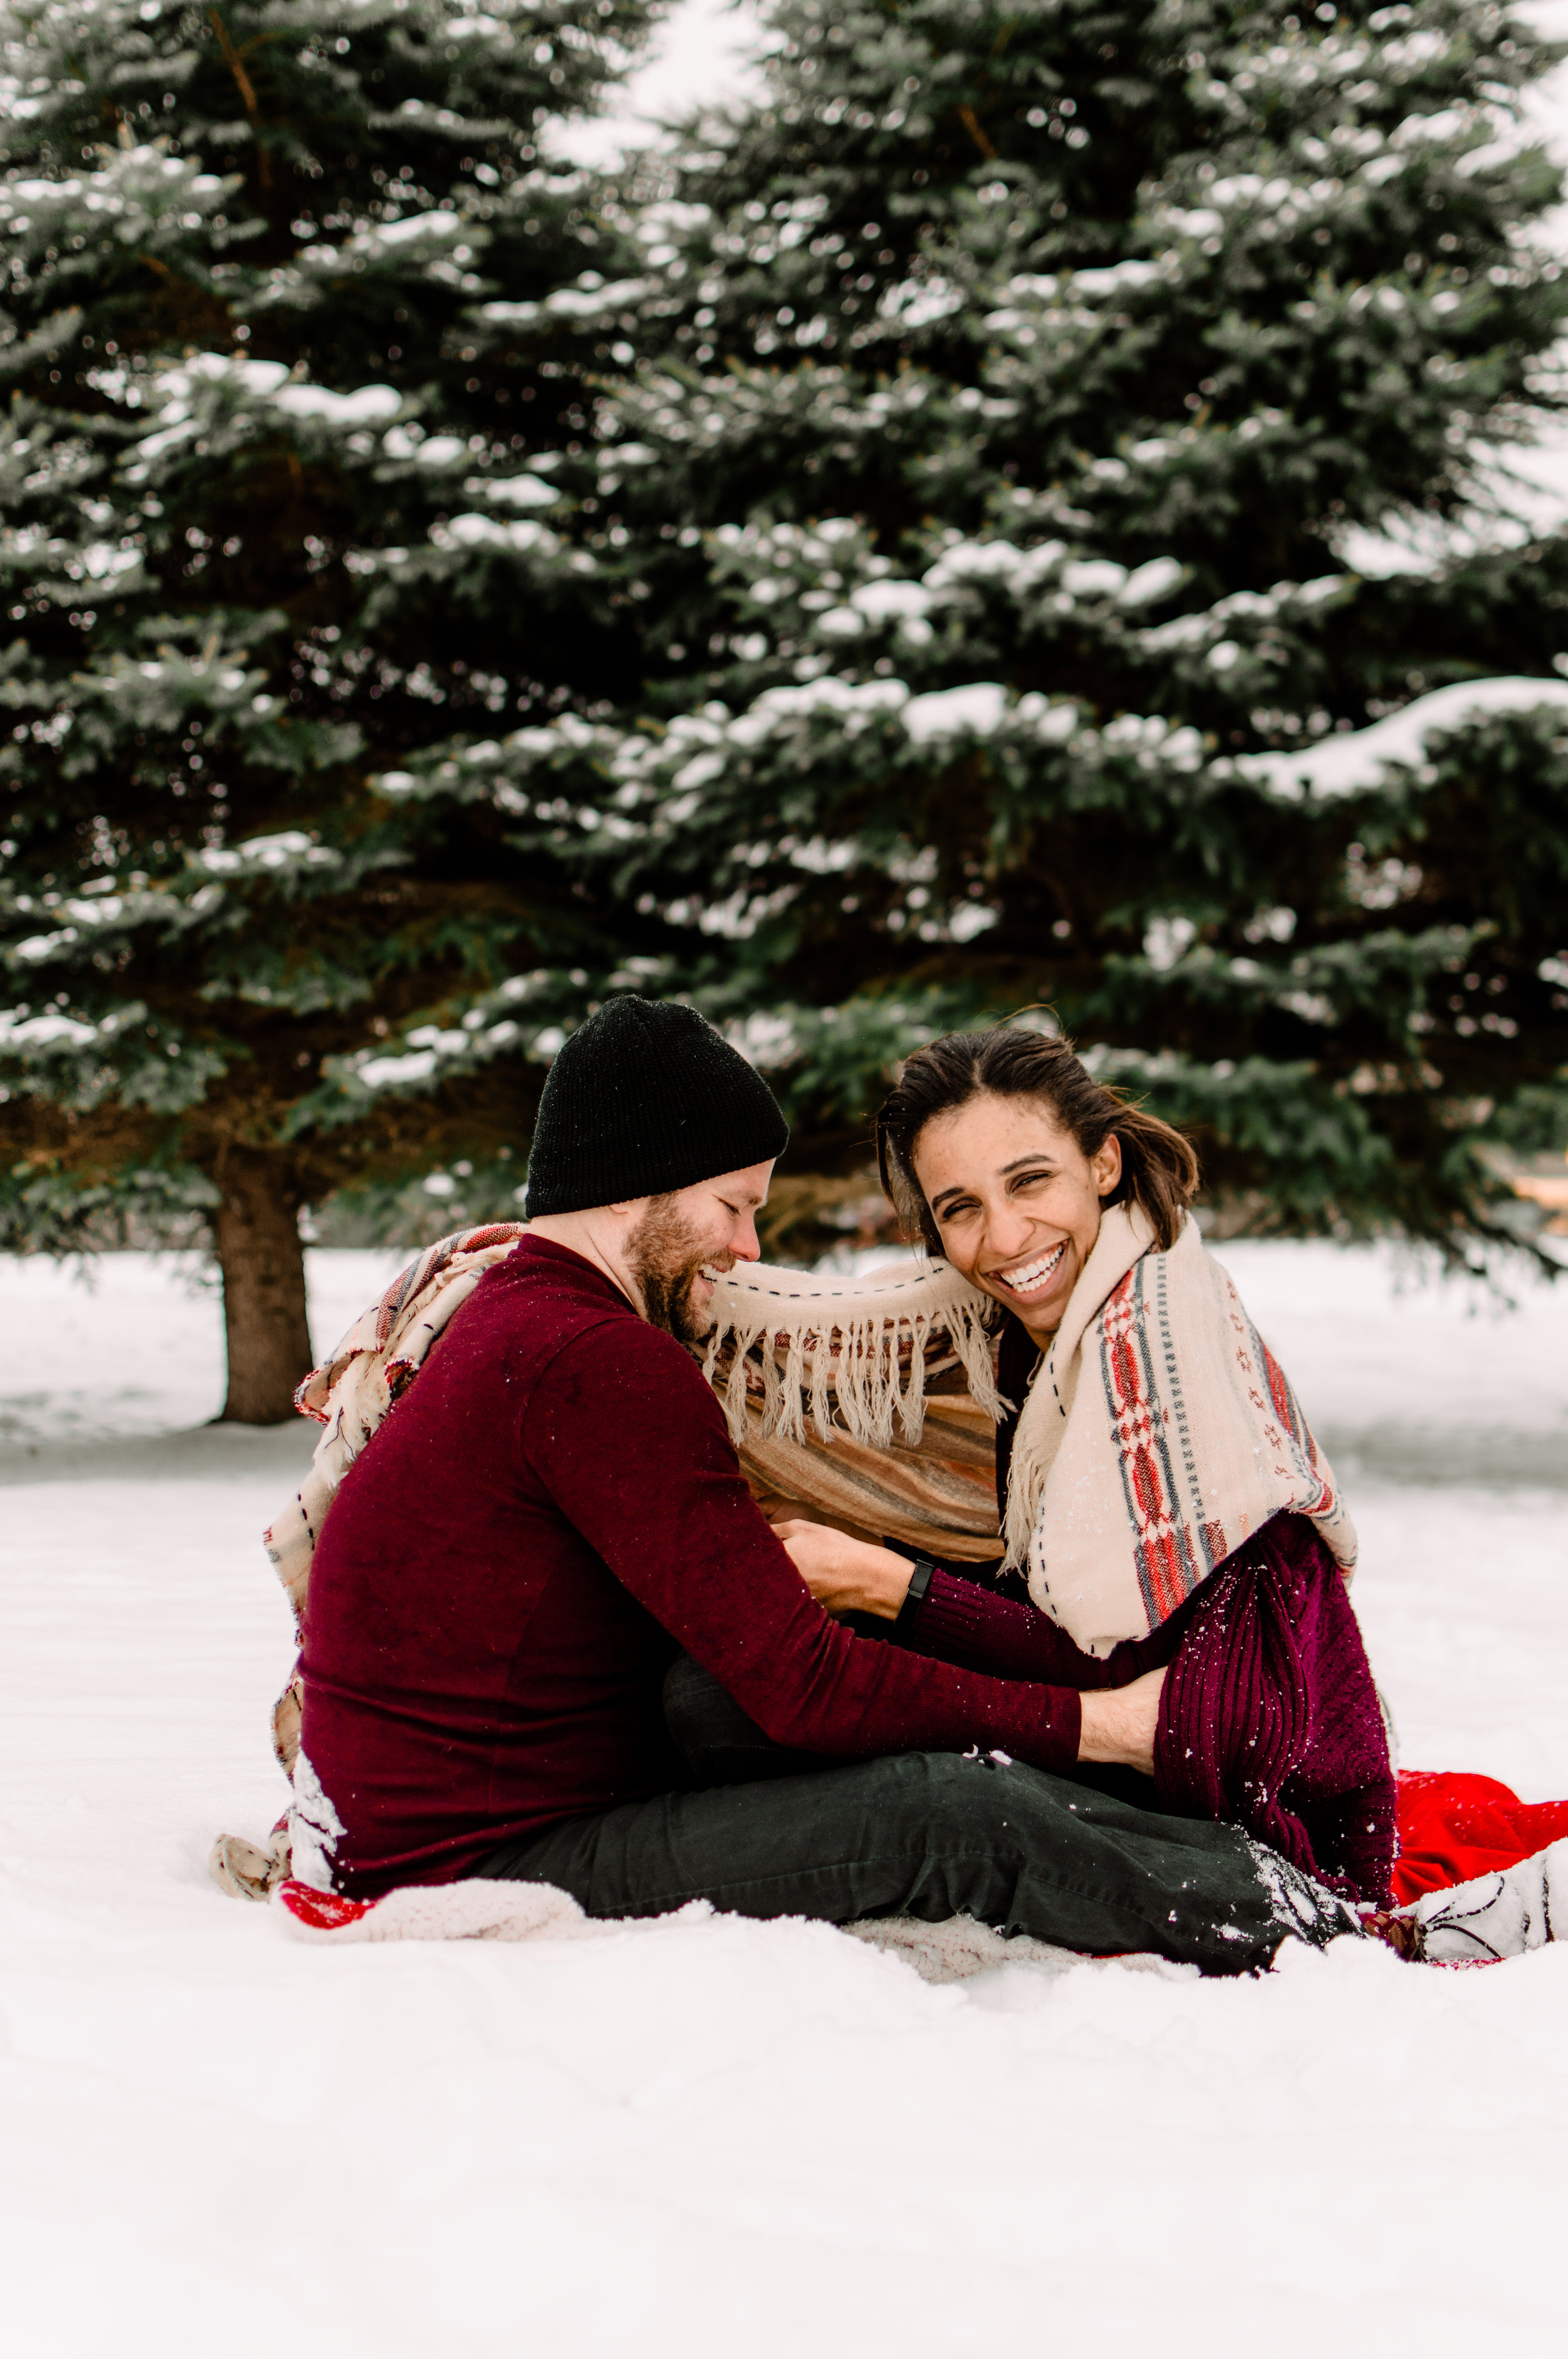 Couples - prices start at 300 usdengagementsanniversaries